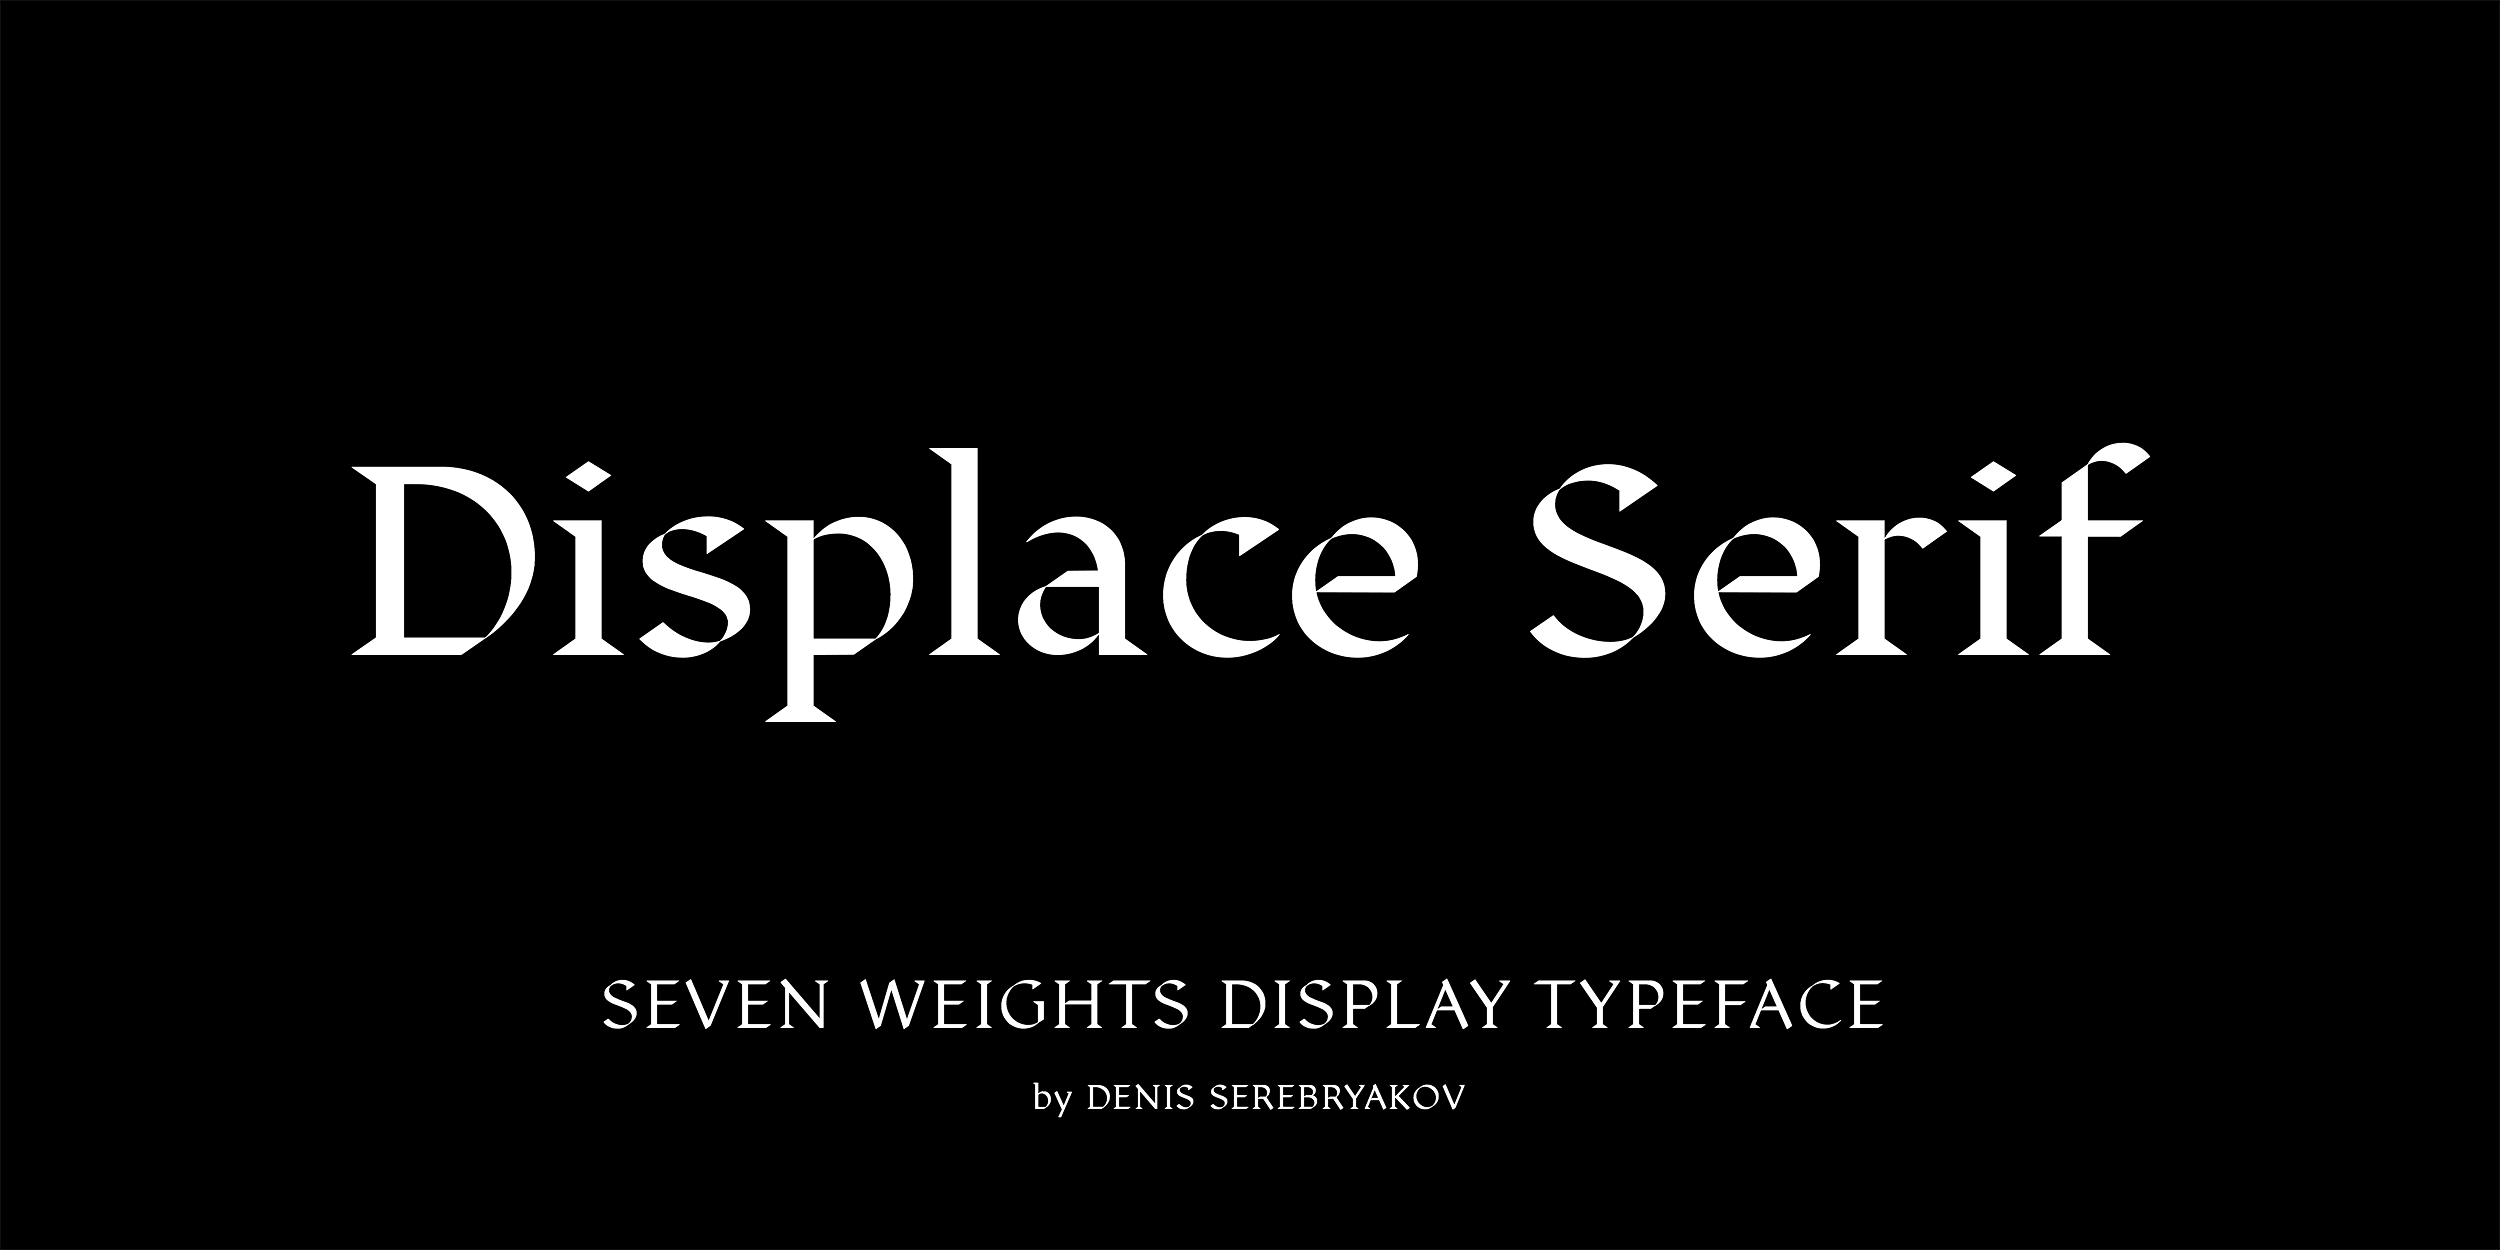 displace_serif_01